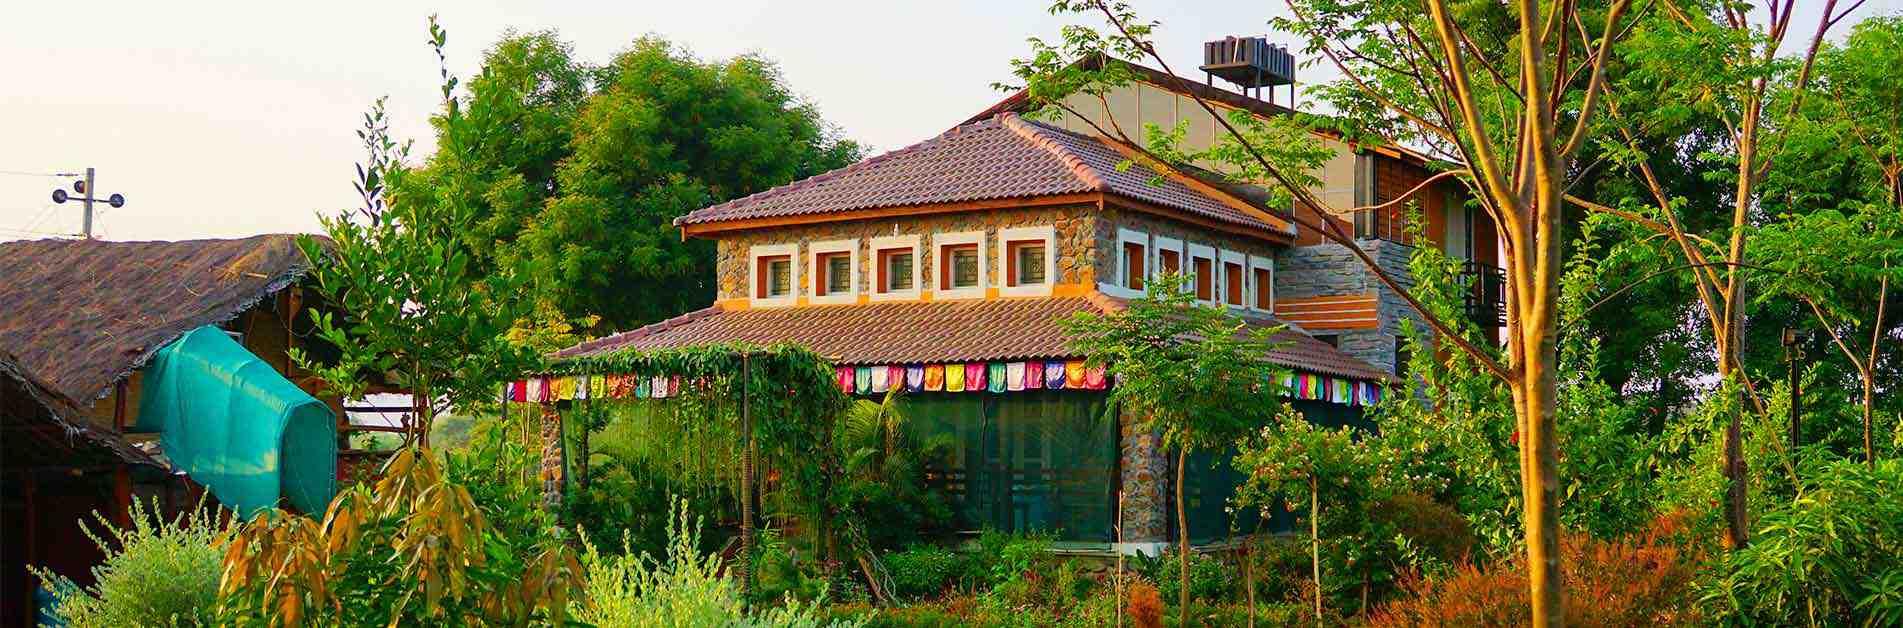 Chukkimane Eco Living near Bangalore